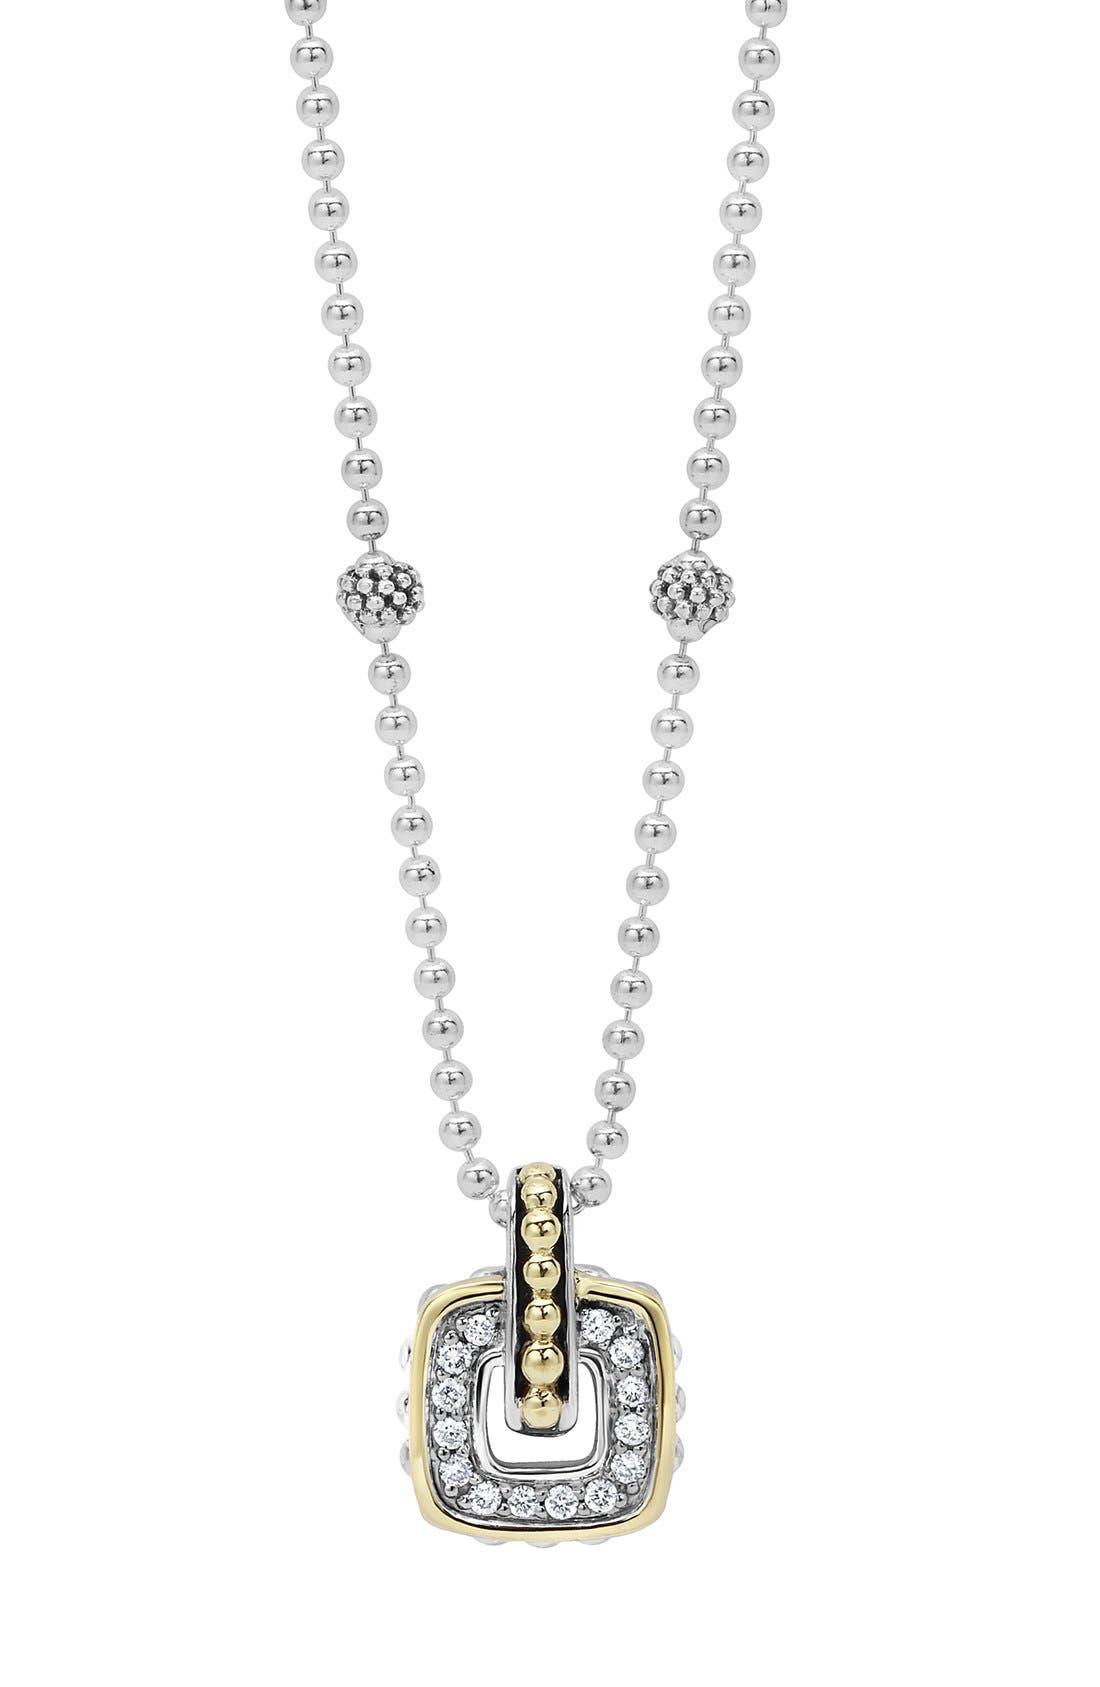 'Cushion' Small Pendant Necklace,                             Main thumbnail 1, color,                             040